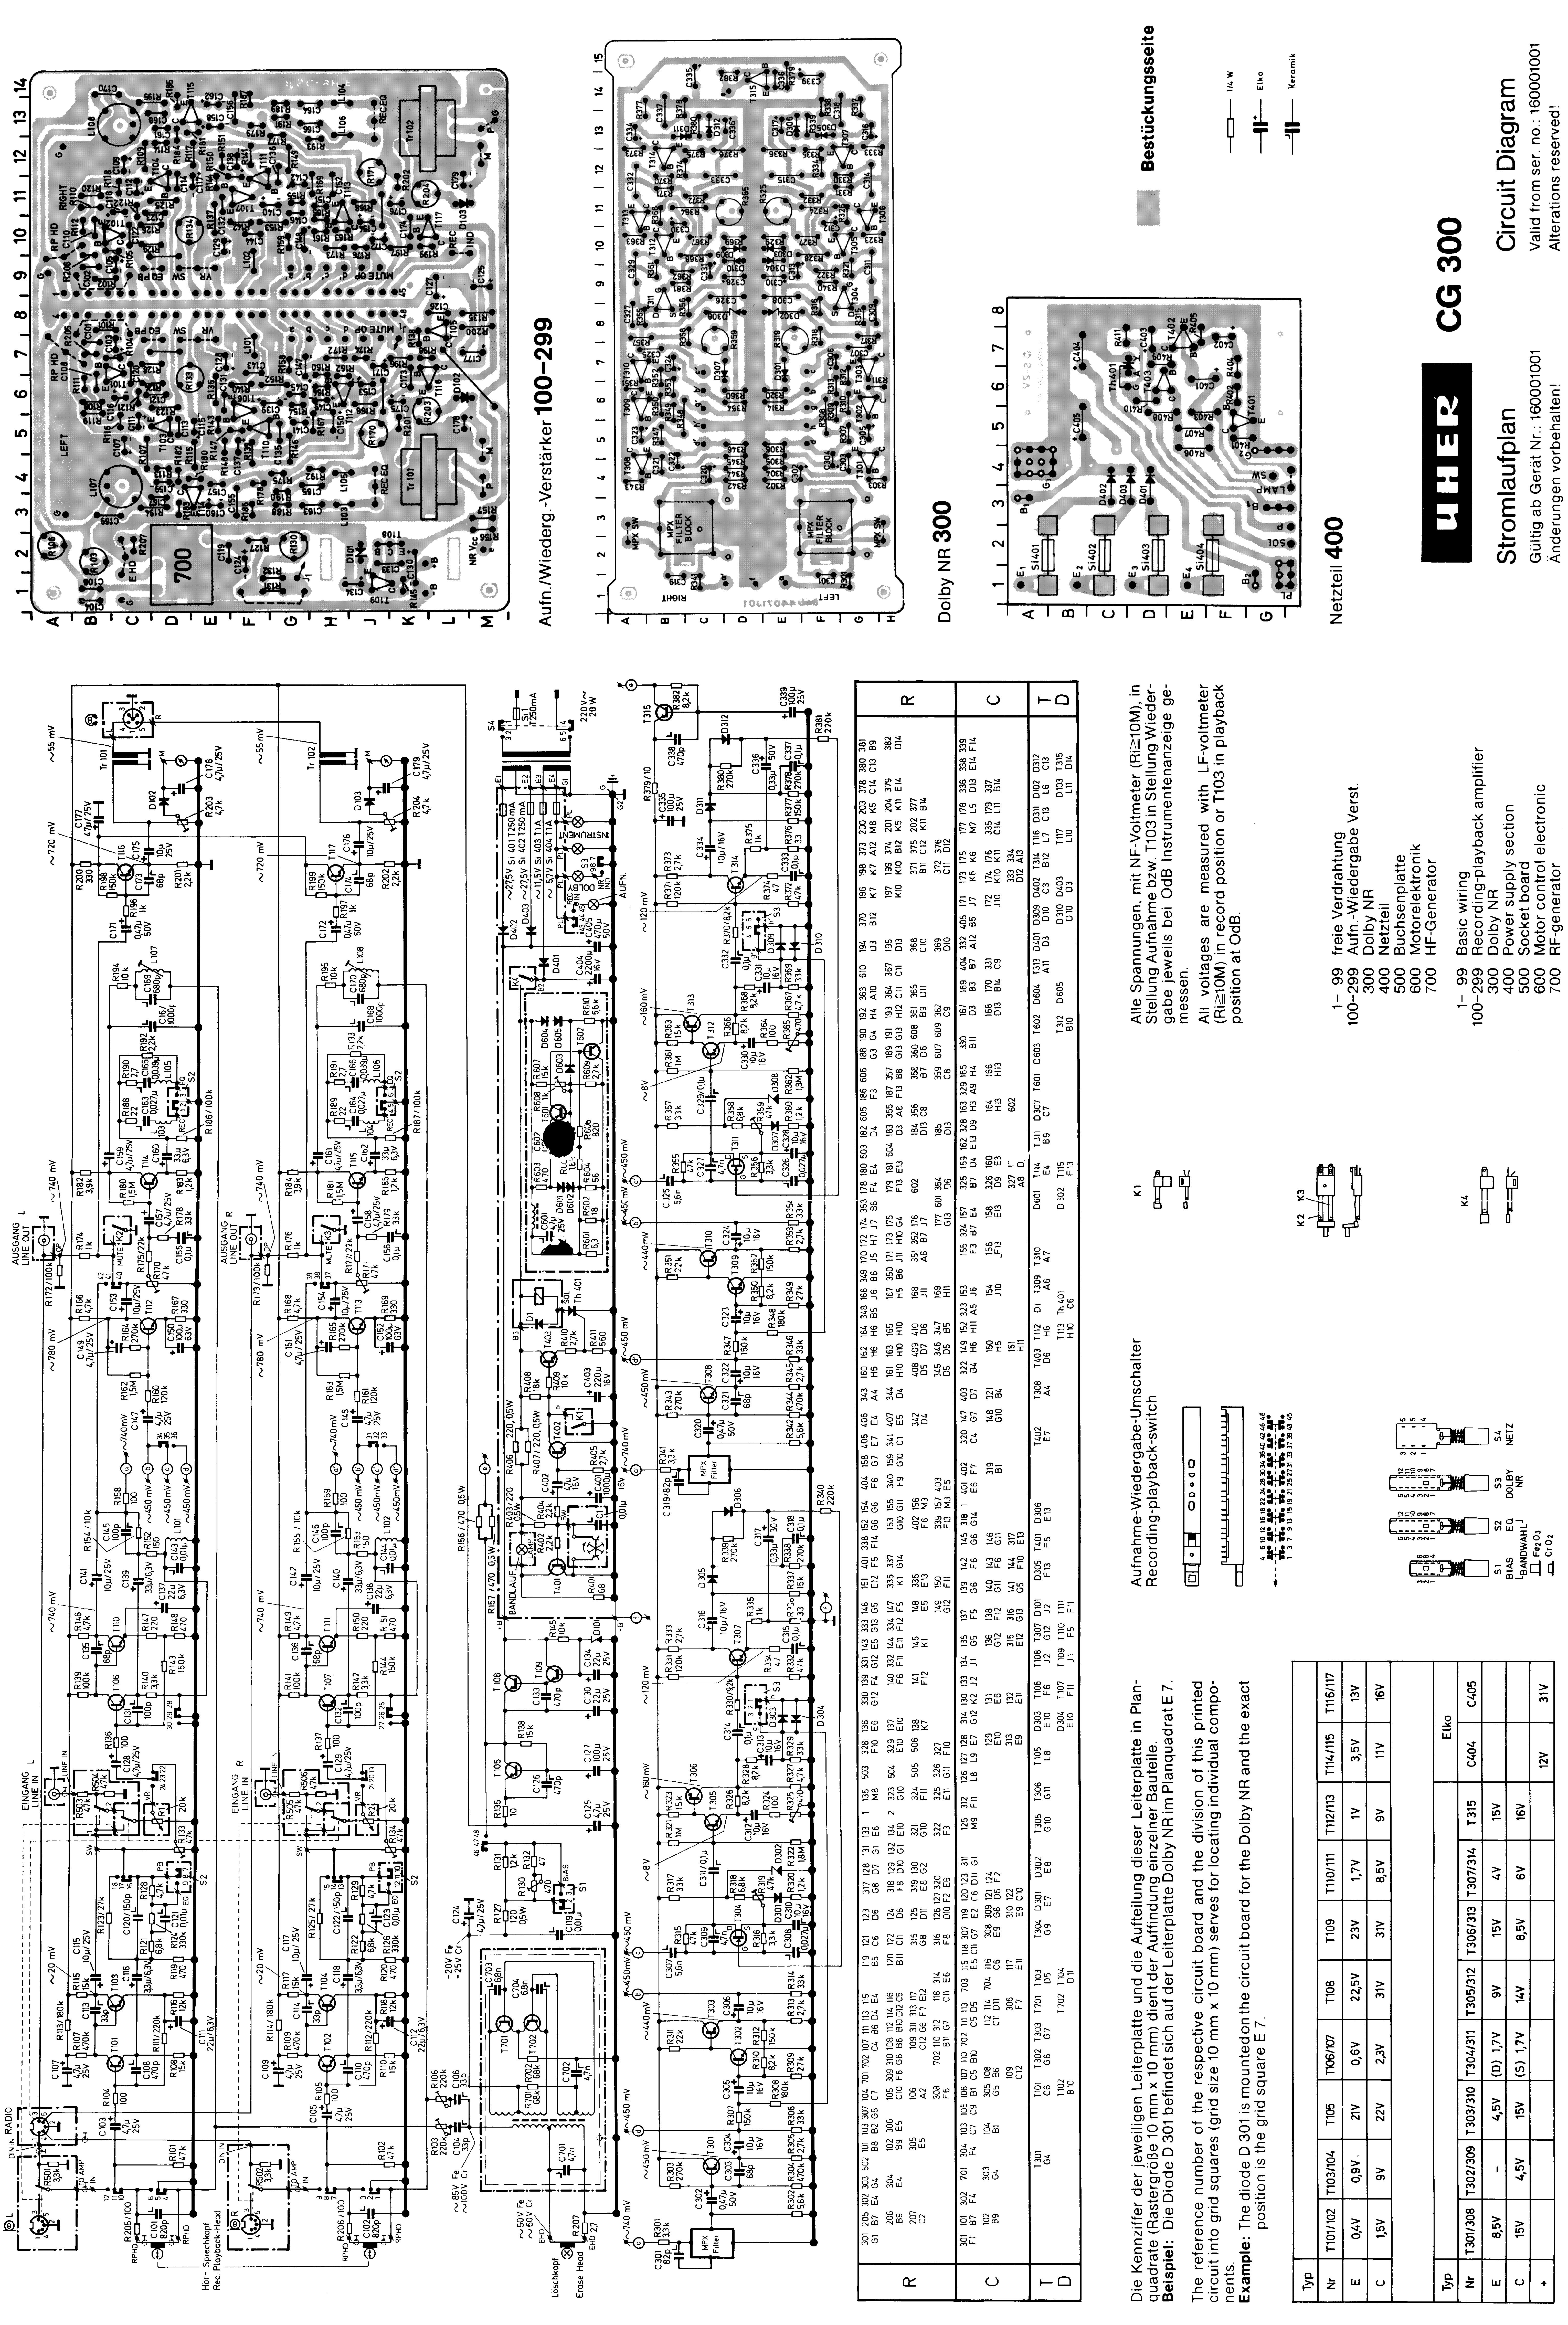 Telex Wiring Diagram Xlr To Clear Com - Product Wiring Diagrams •